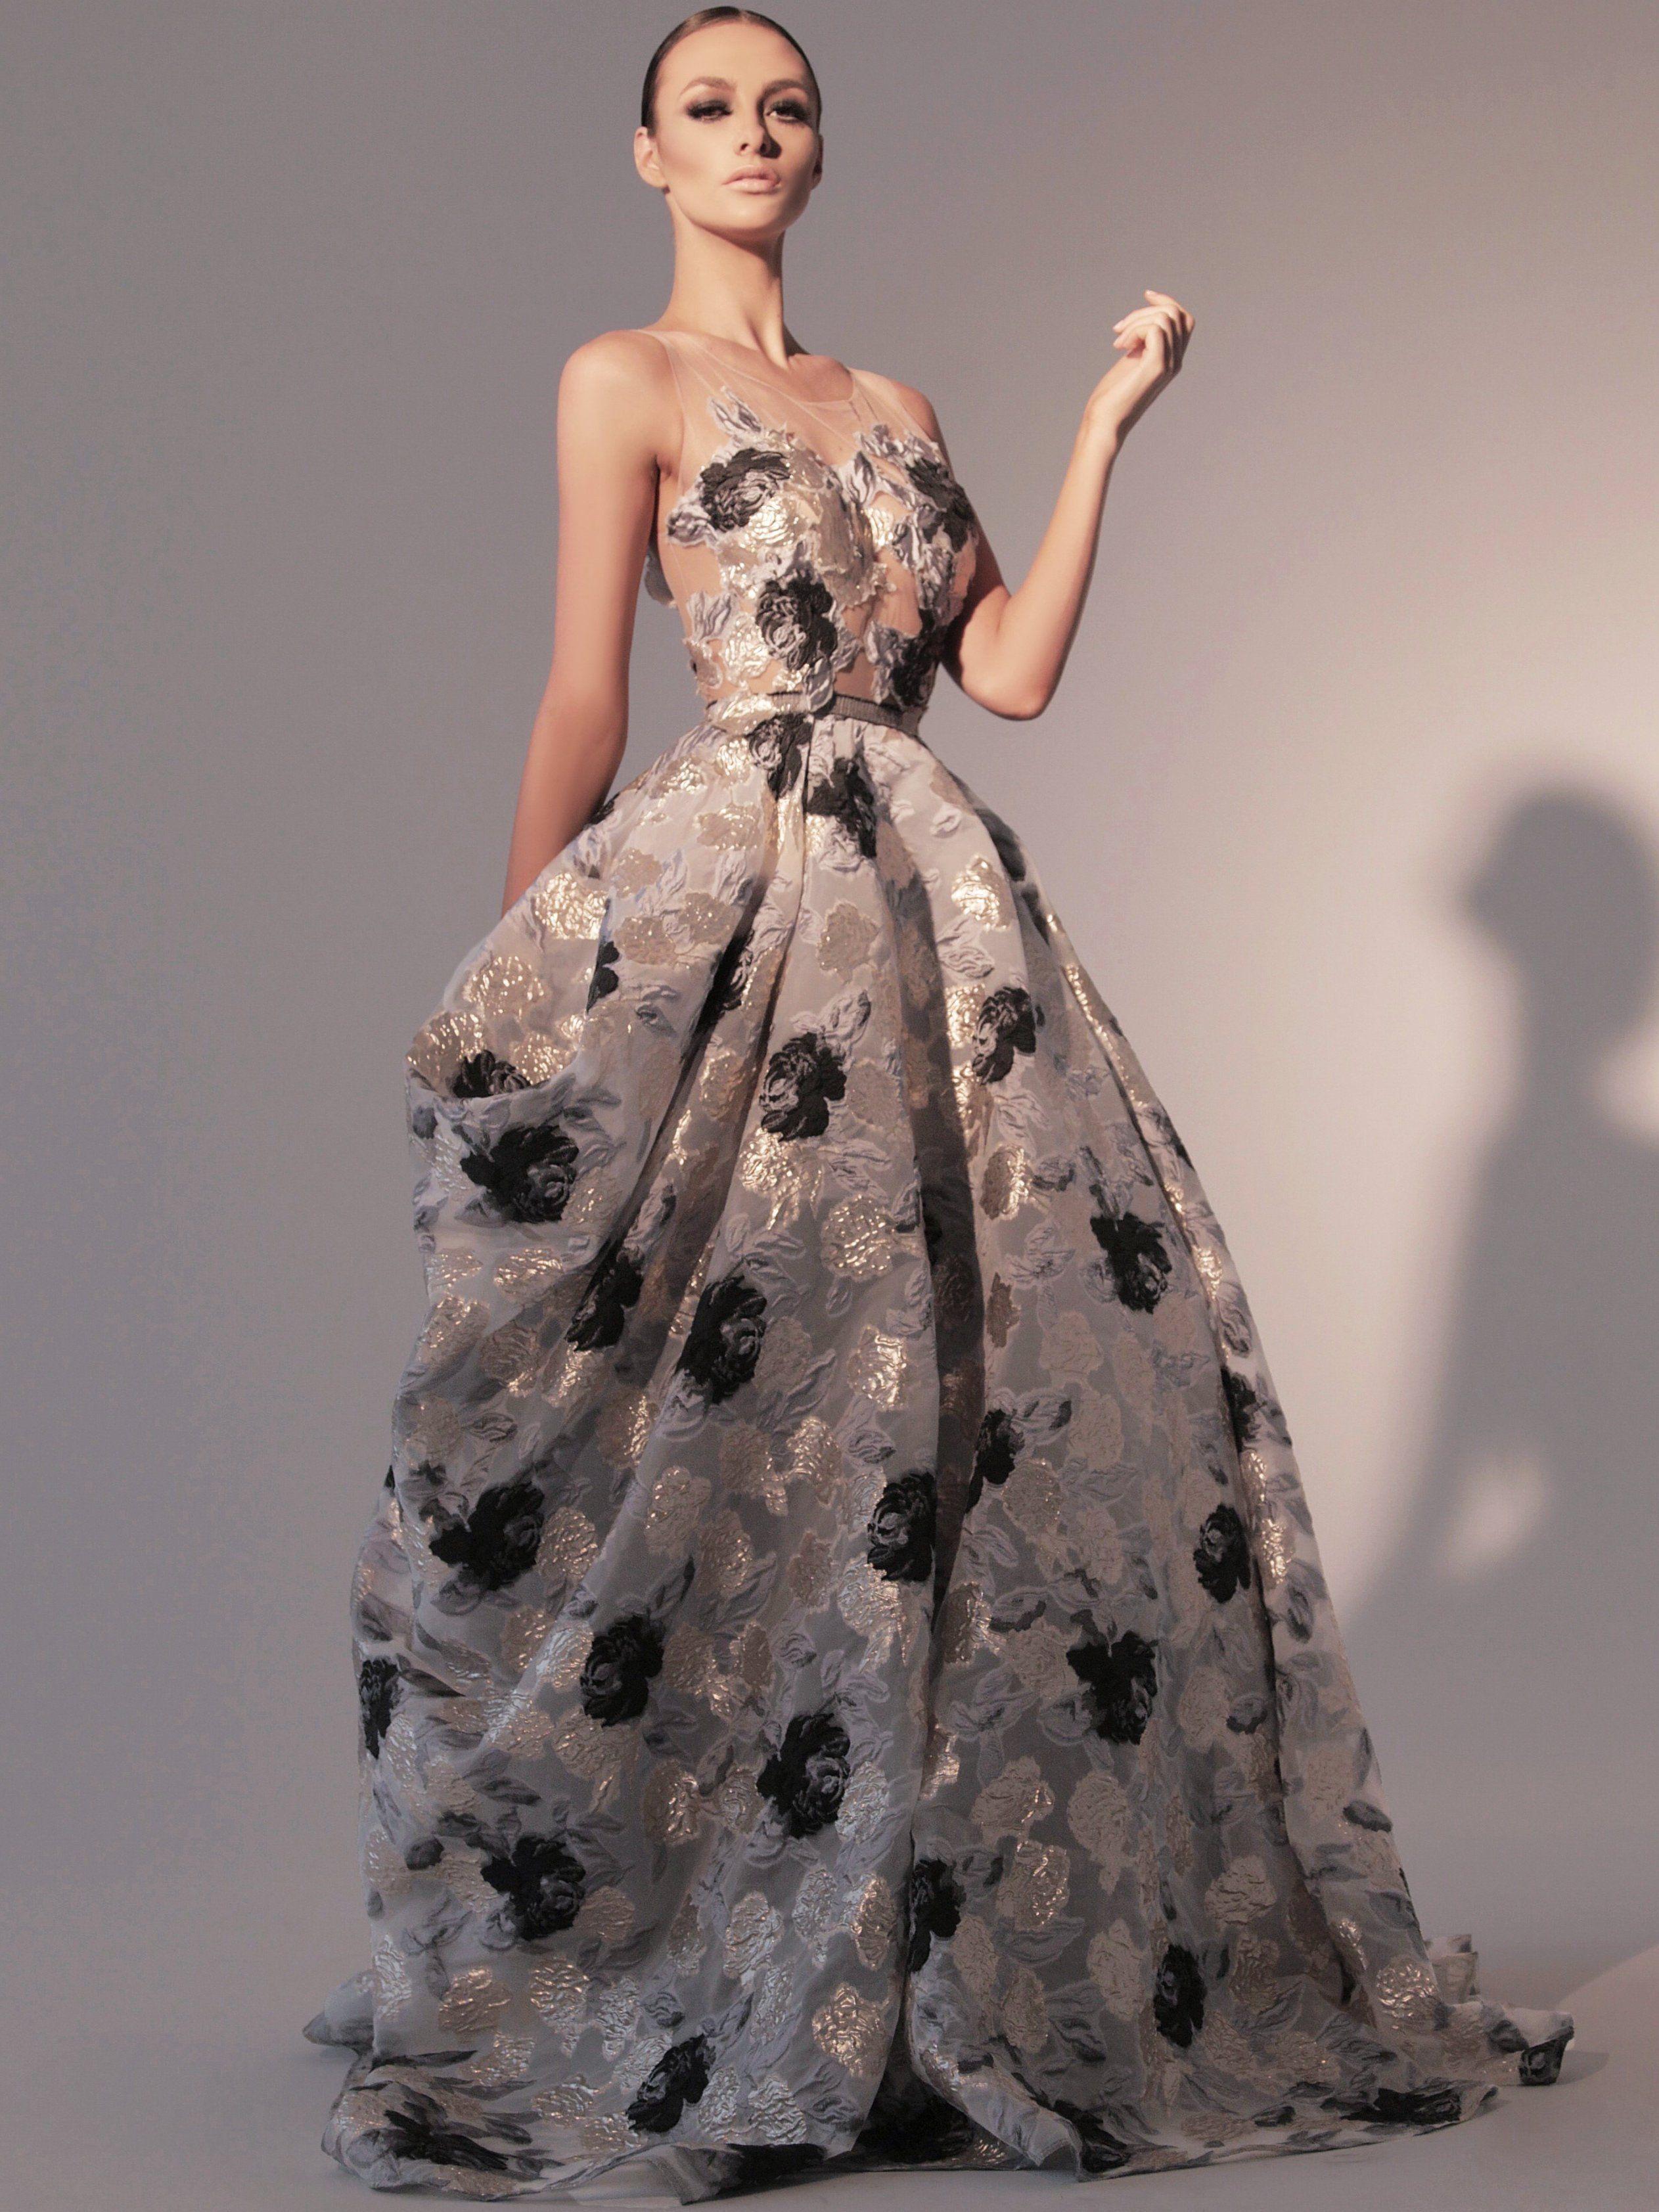 Nicole Bakti Floral Print Ball Gown